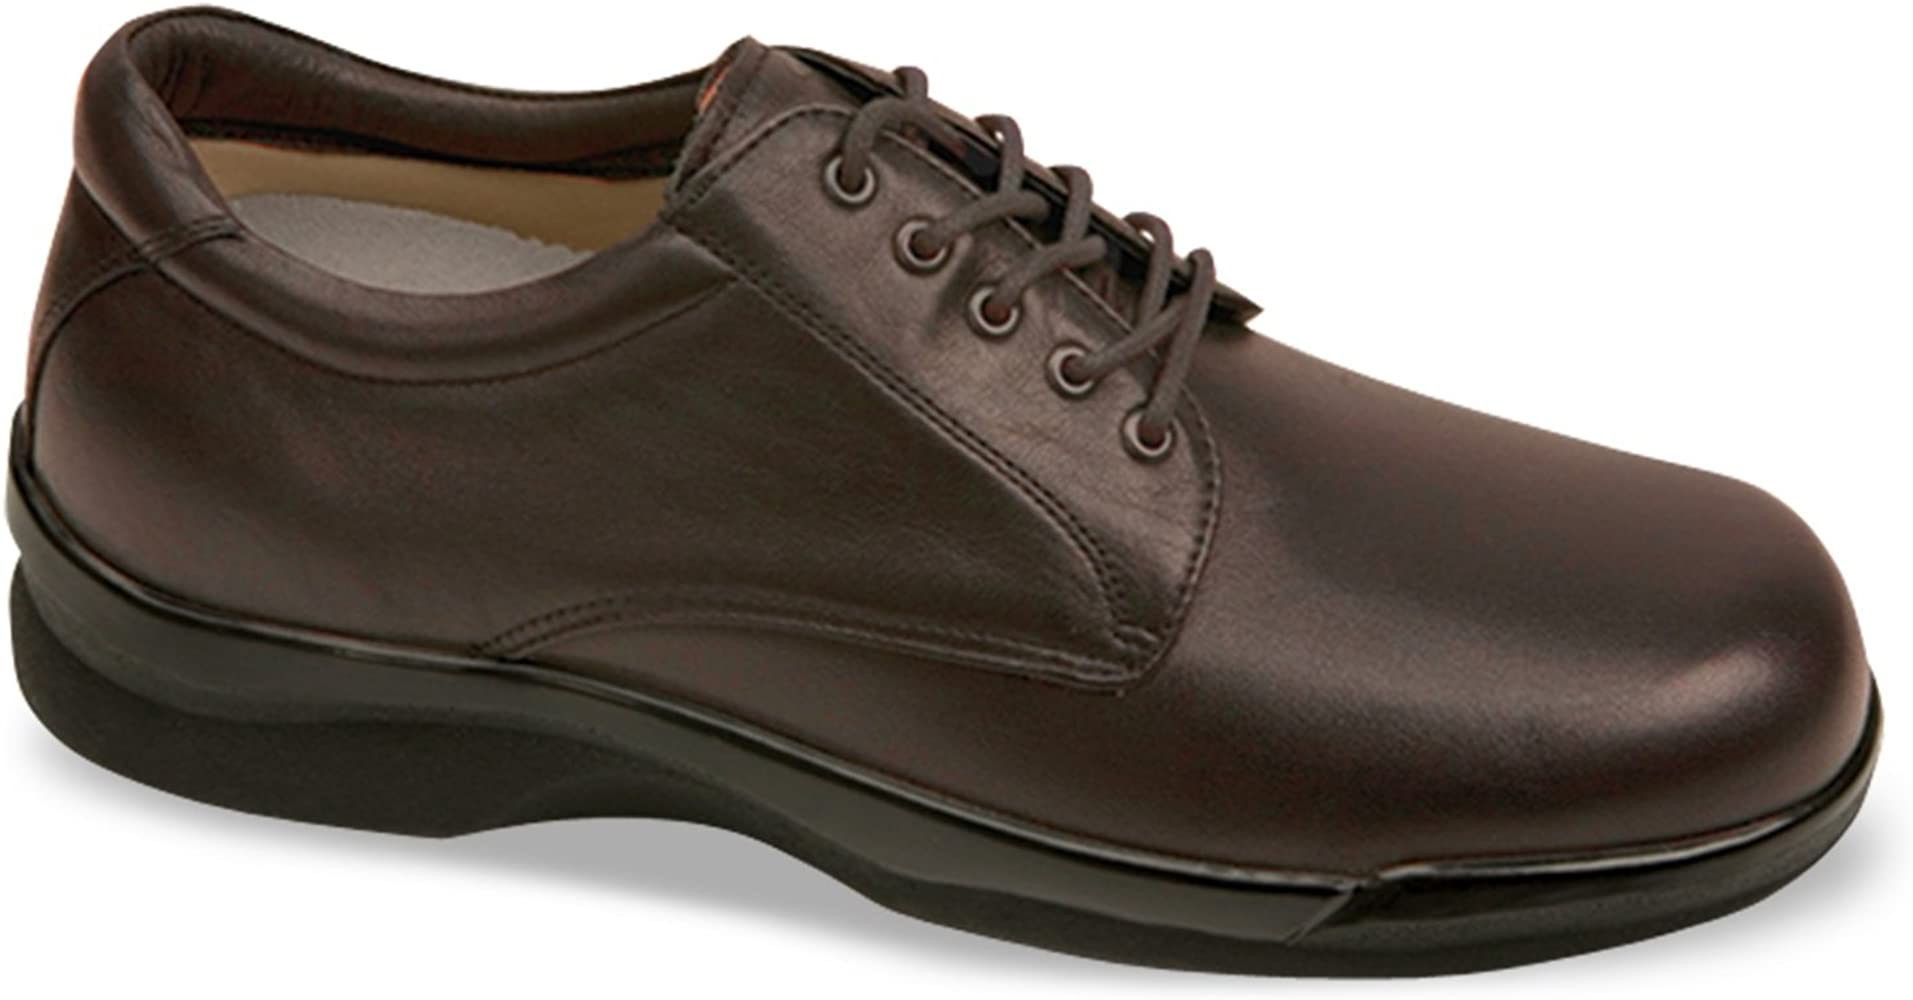 Ambulator Classic Oxford Shoes | Oxfords